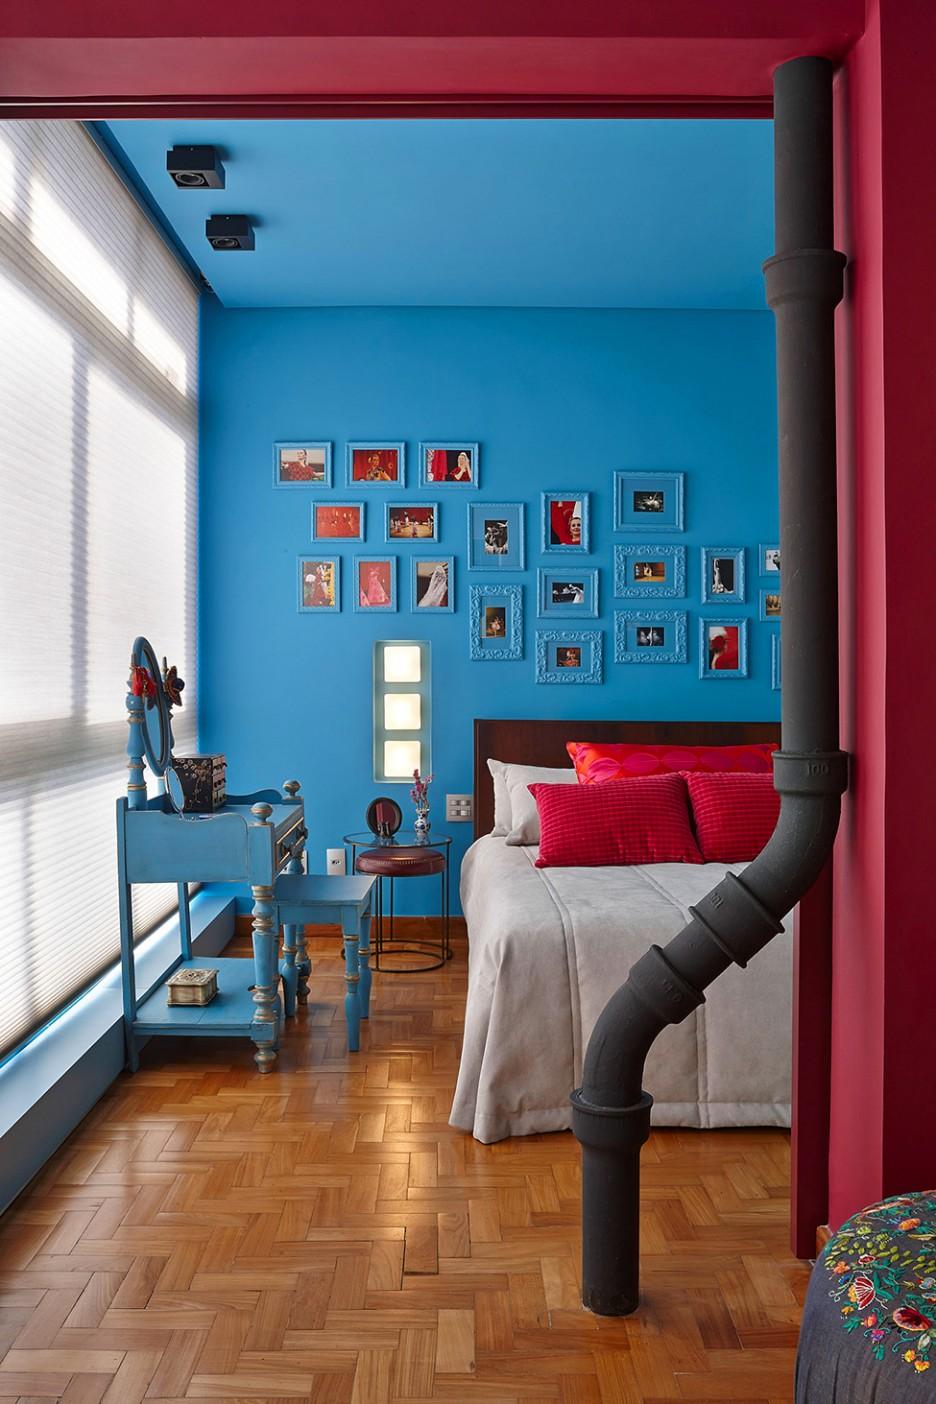 Interior Home: Minimalist Bedroom Interior Design Applied In Belo ...